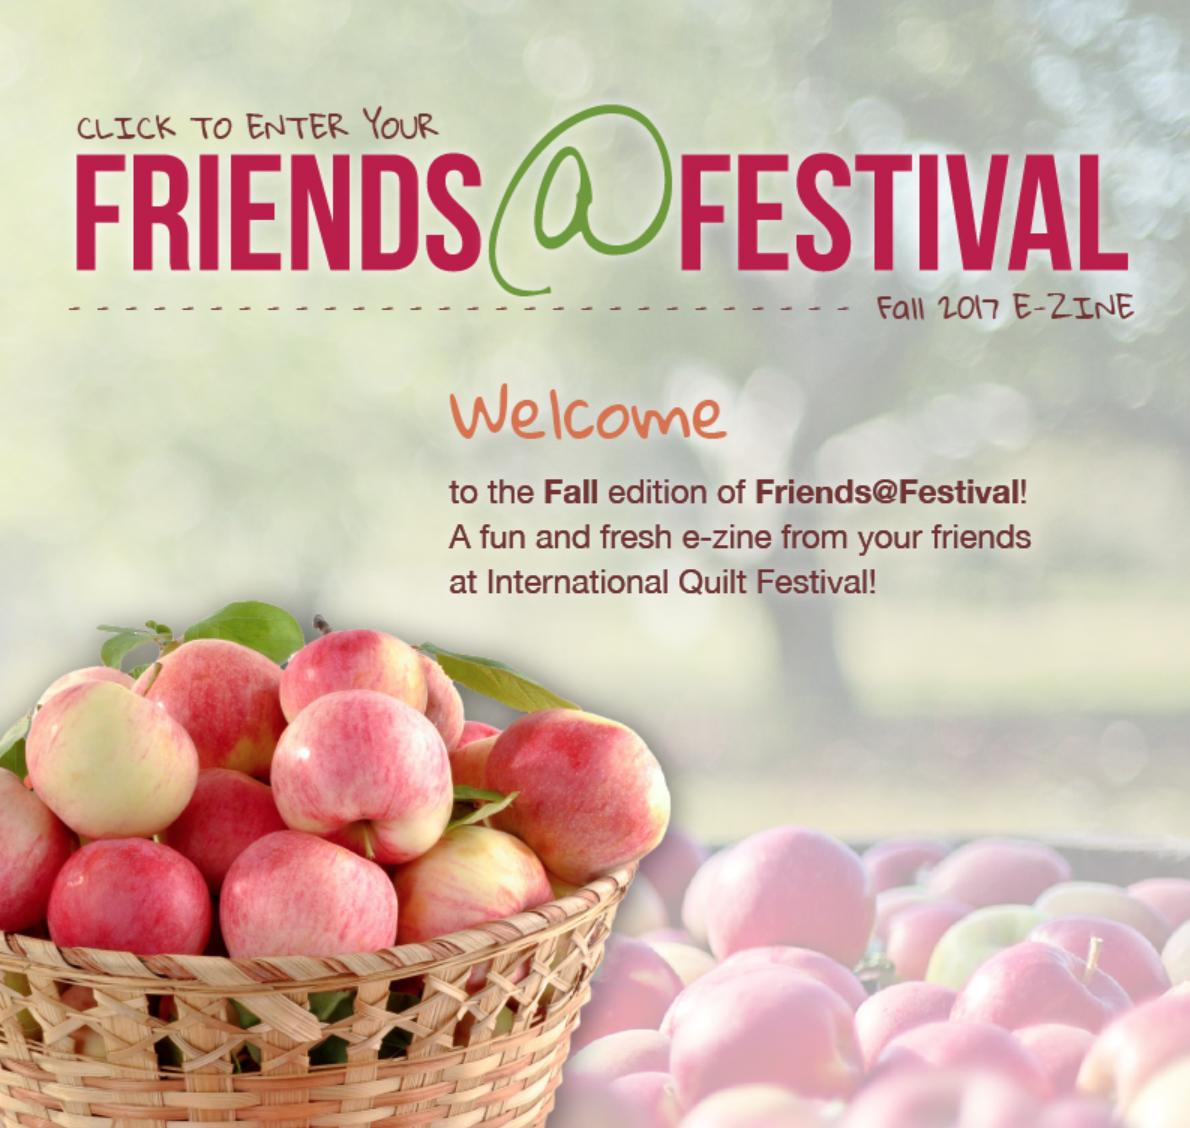 Friends@Festival1